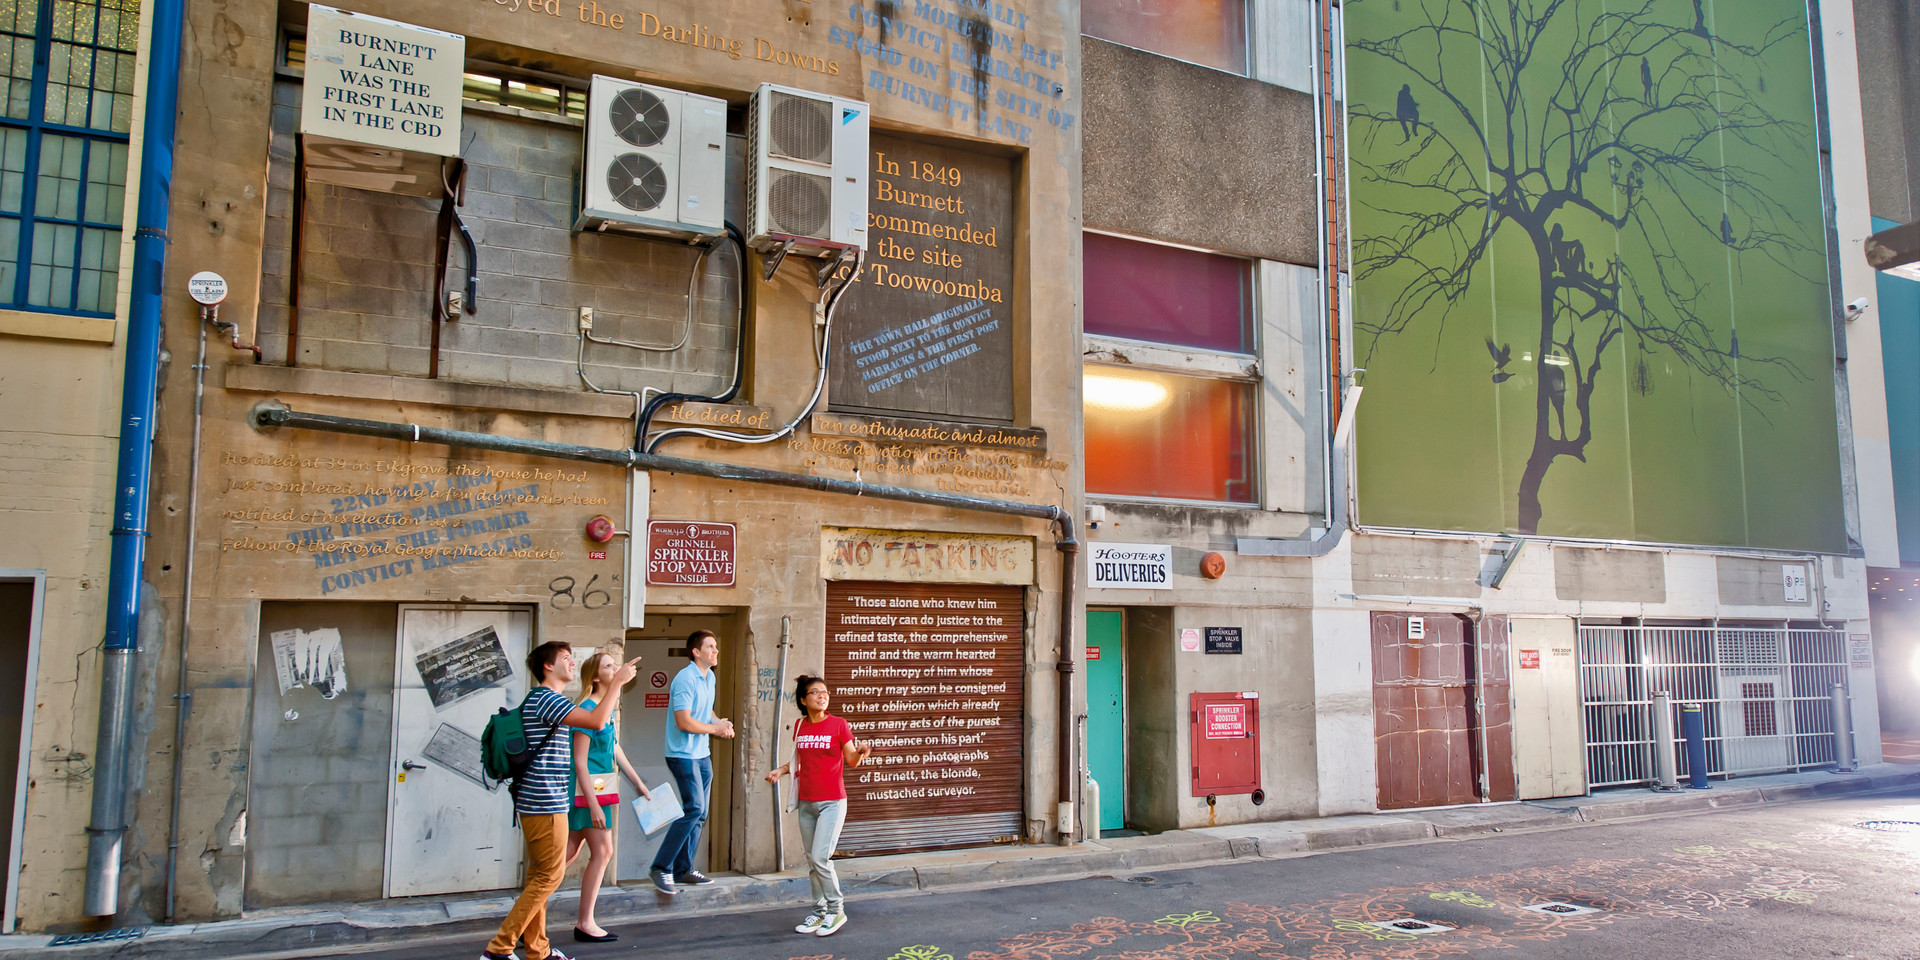 Brisbane Greeters - Burnett Lane